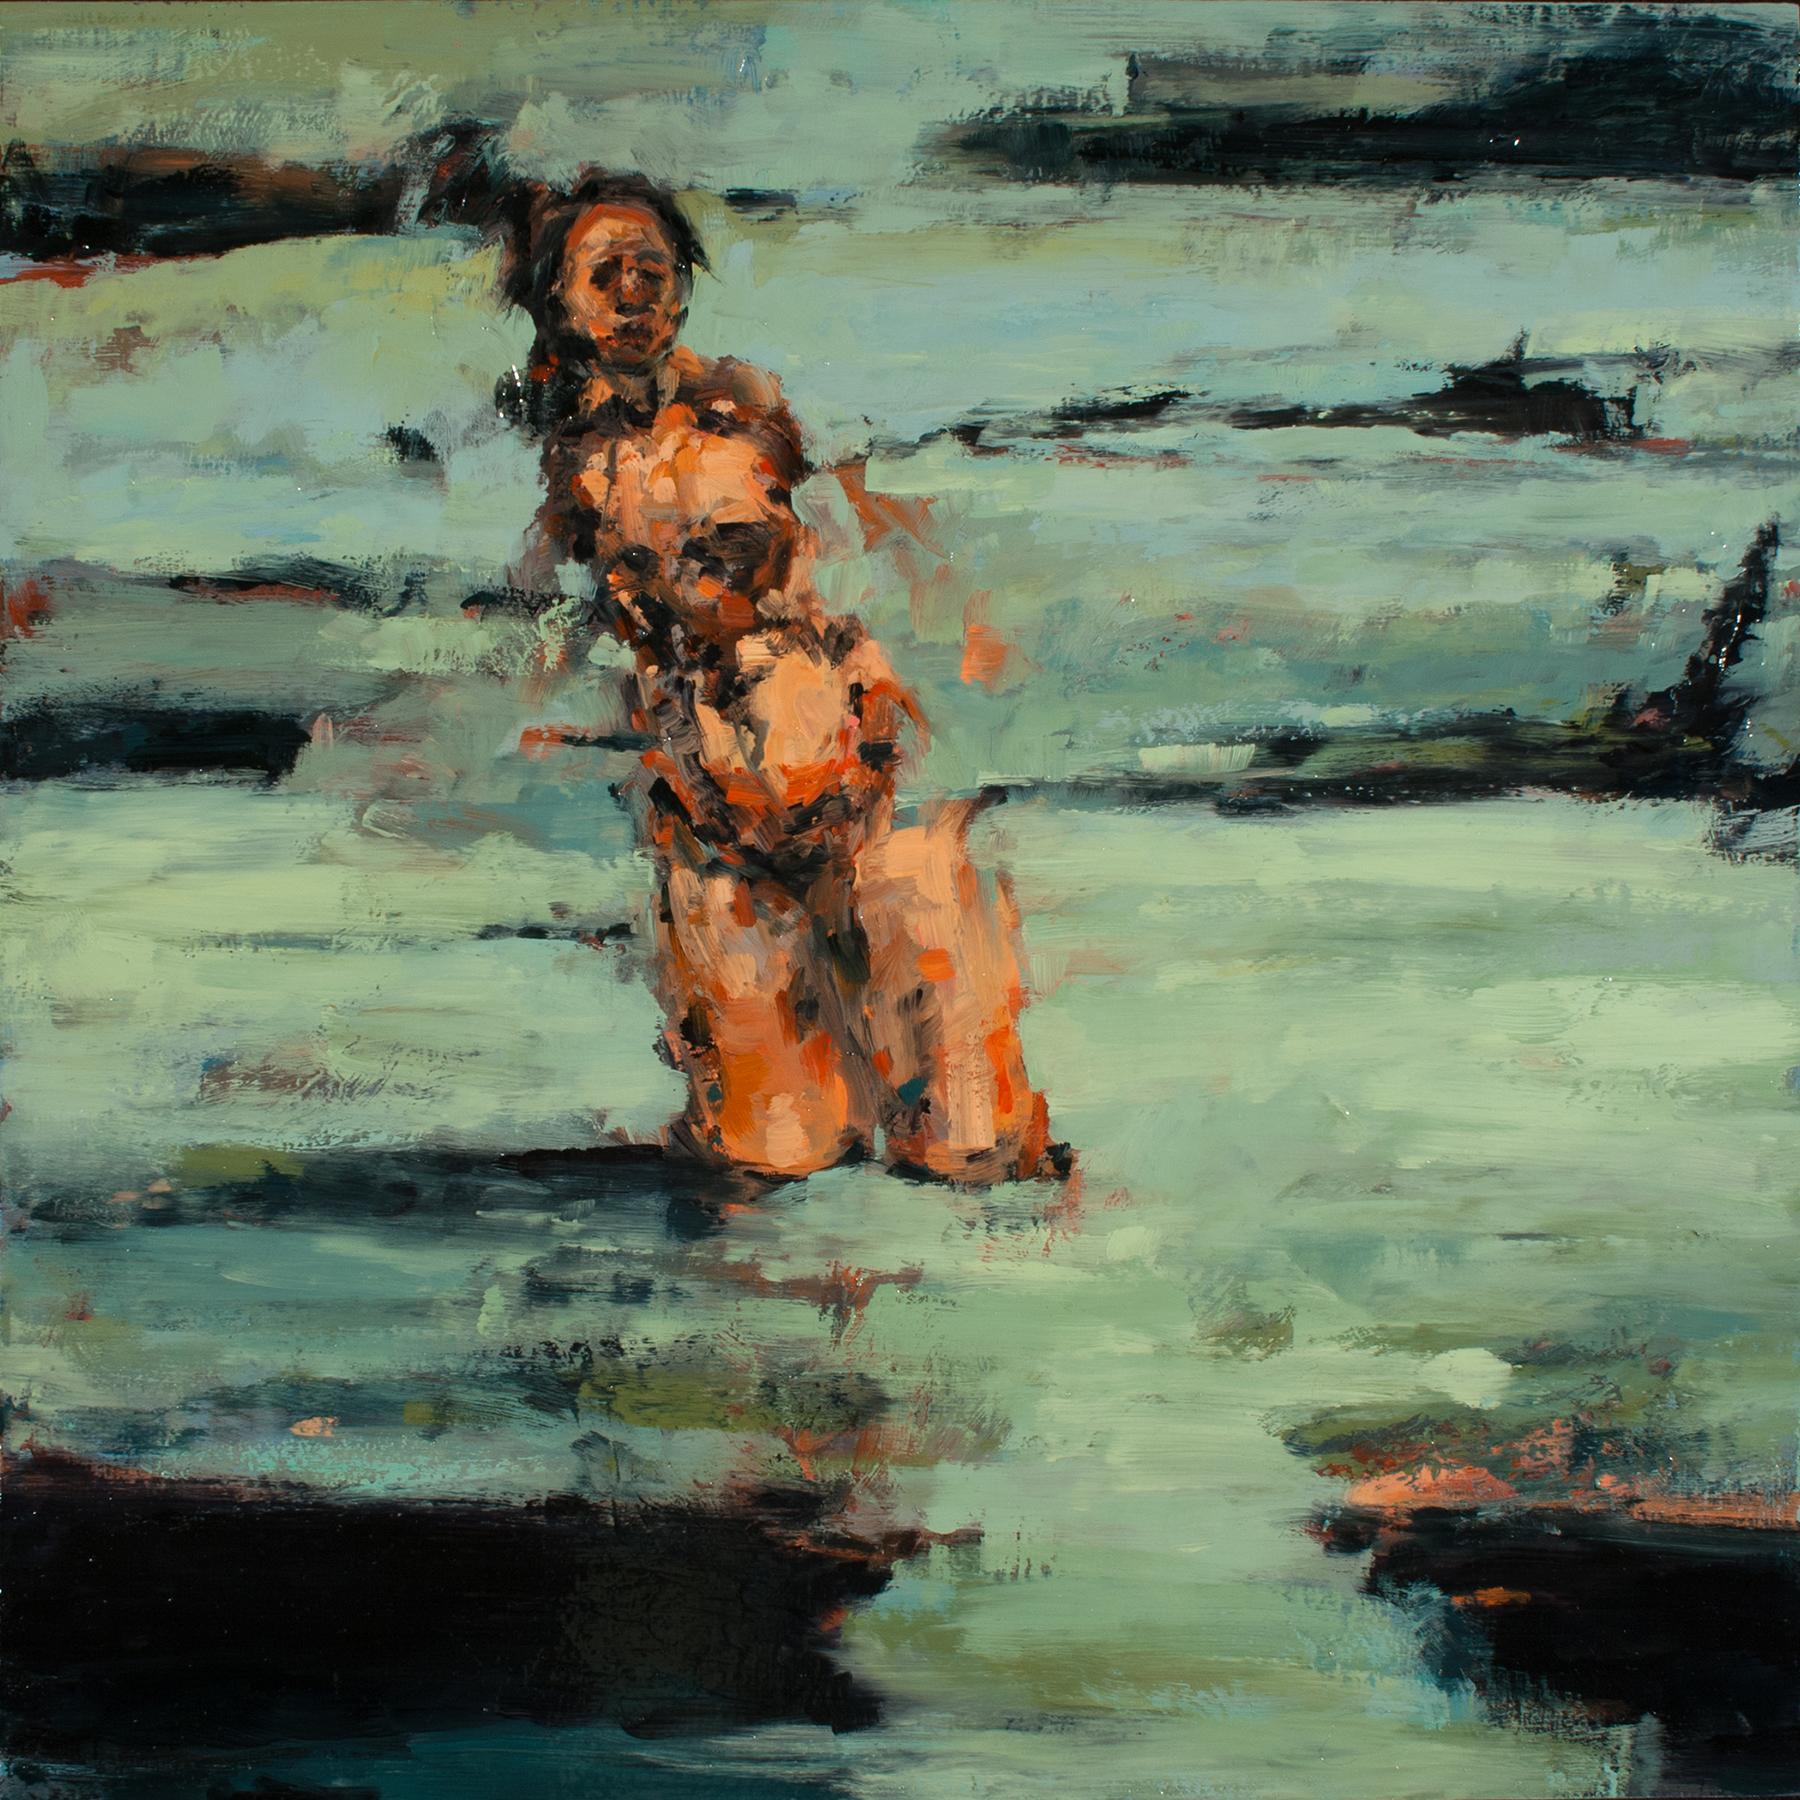 "Hinge (Struggle), oil on board, 16"" x 16"" x 2"", 2013"